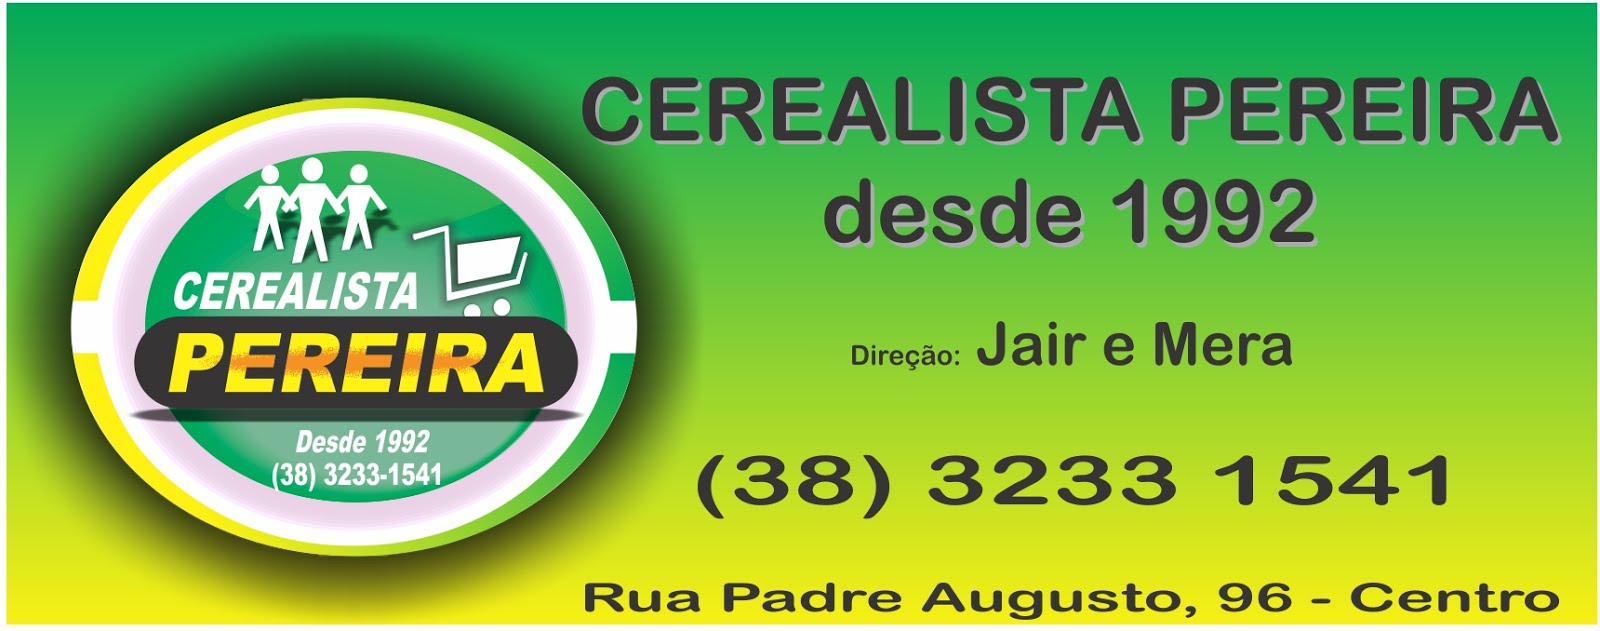 Cerealista Pereira